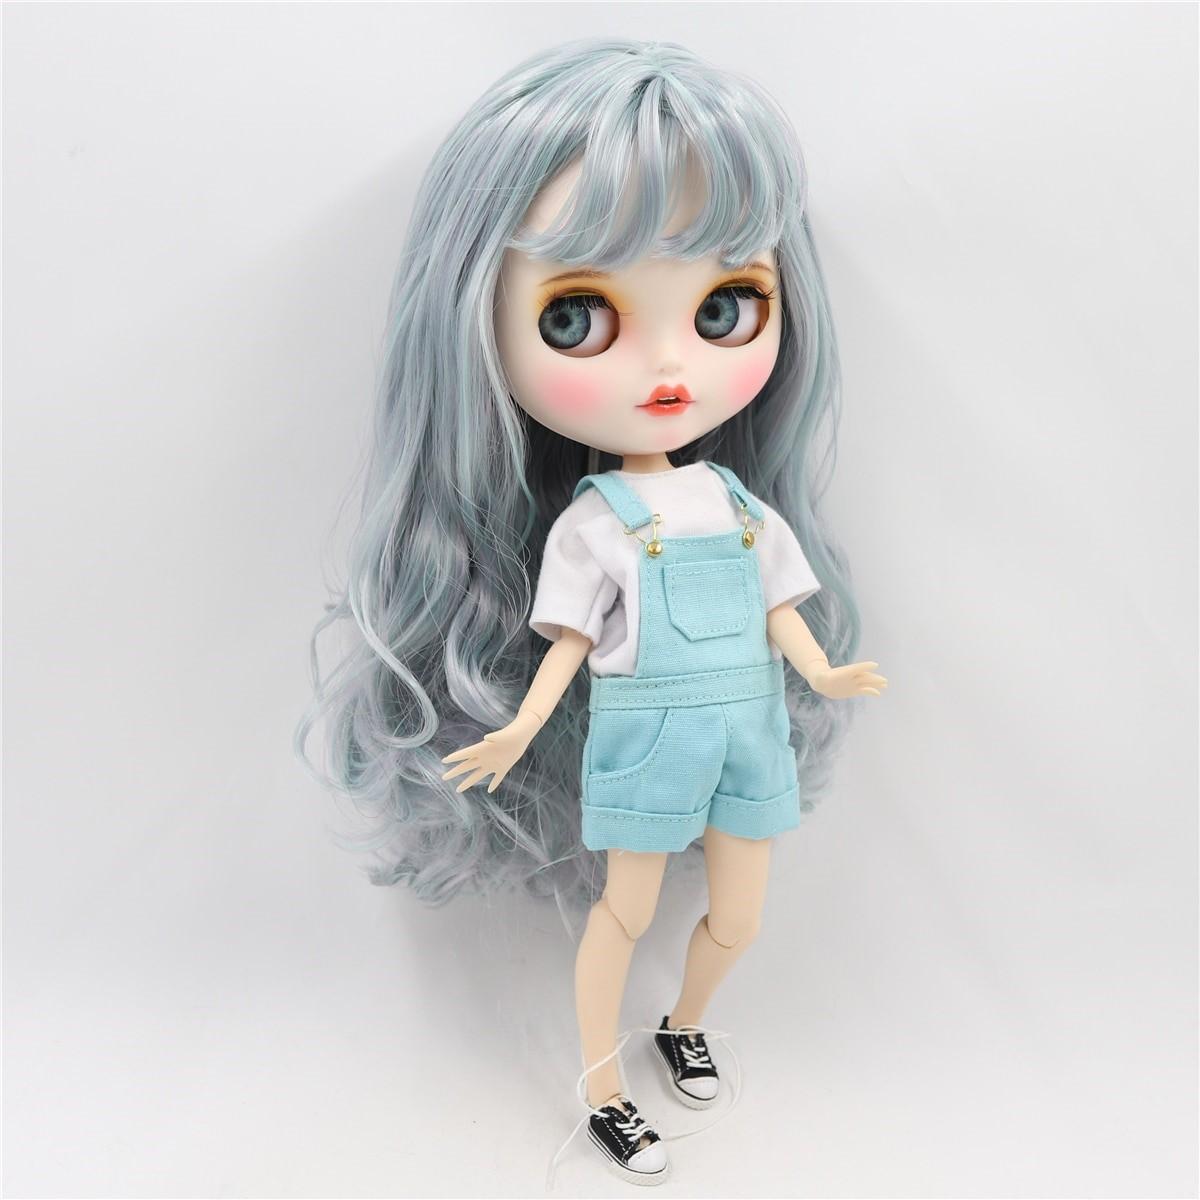 Liza - Premium Custom Blythe Doll with Clothes Smiling Face Premium Blythe Dolls 🆕 Smiling Face